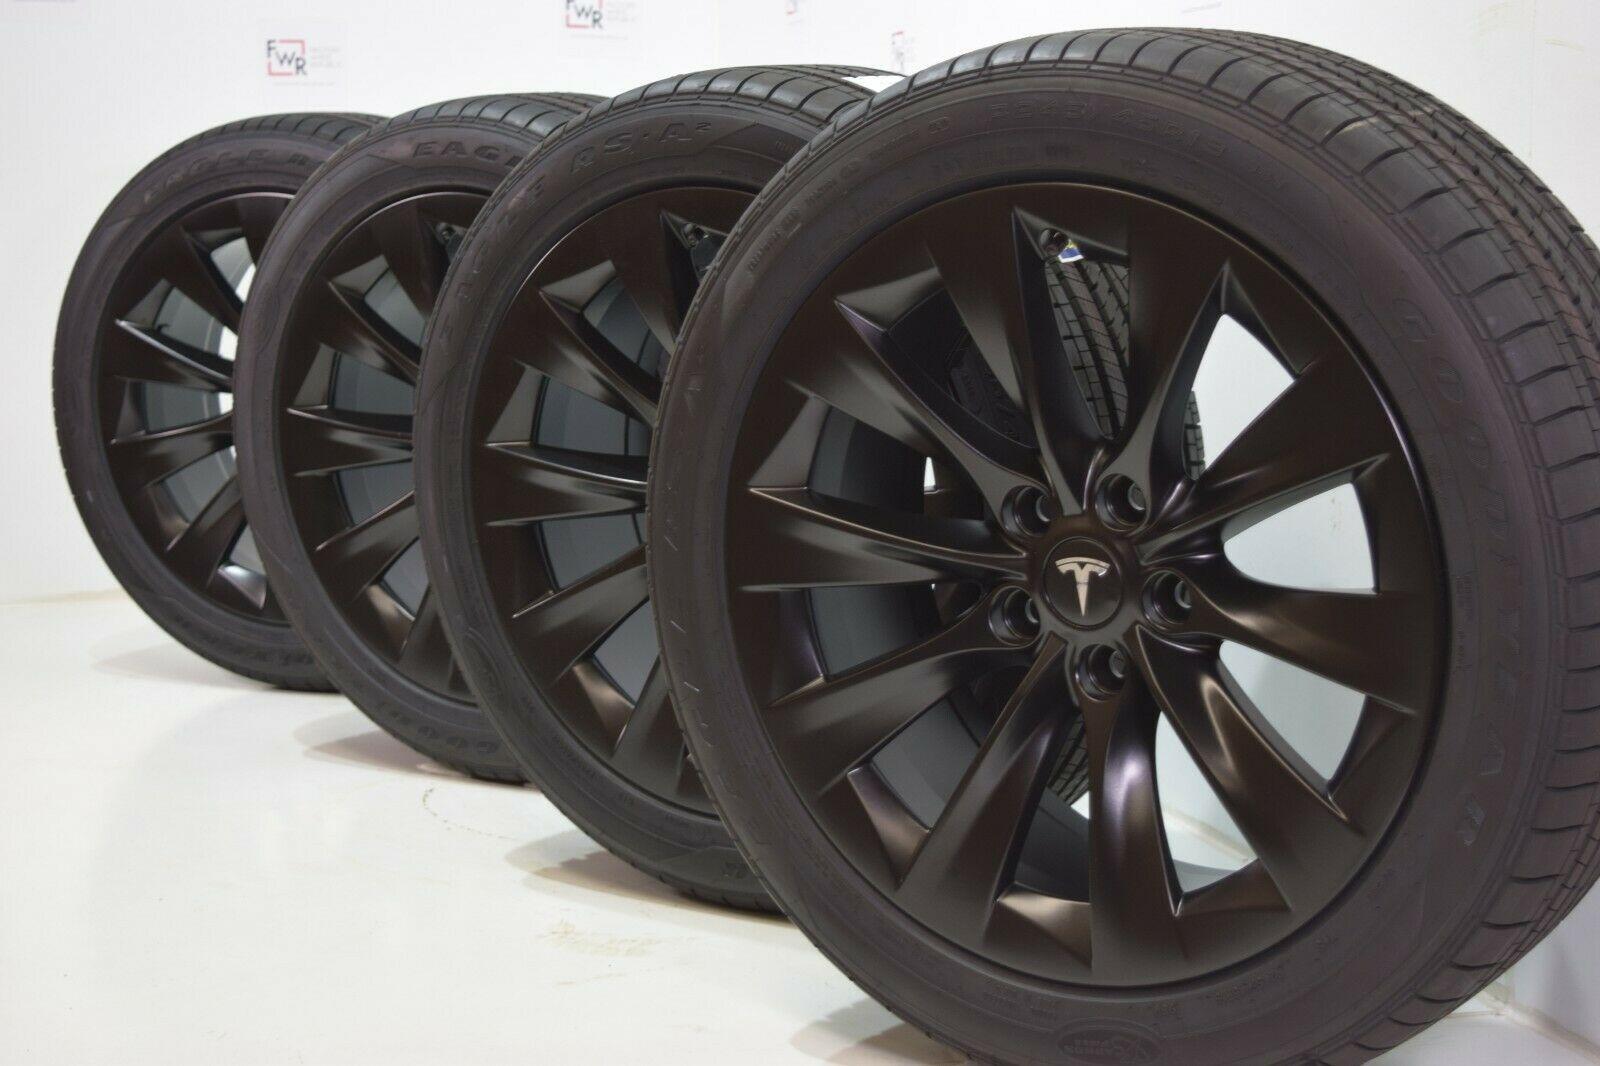 19 Tesla Model S Slipstream Factory Oem Black Wheels Rims Tires Goodyear Factory Wheel Republic